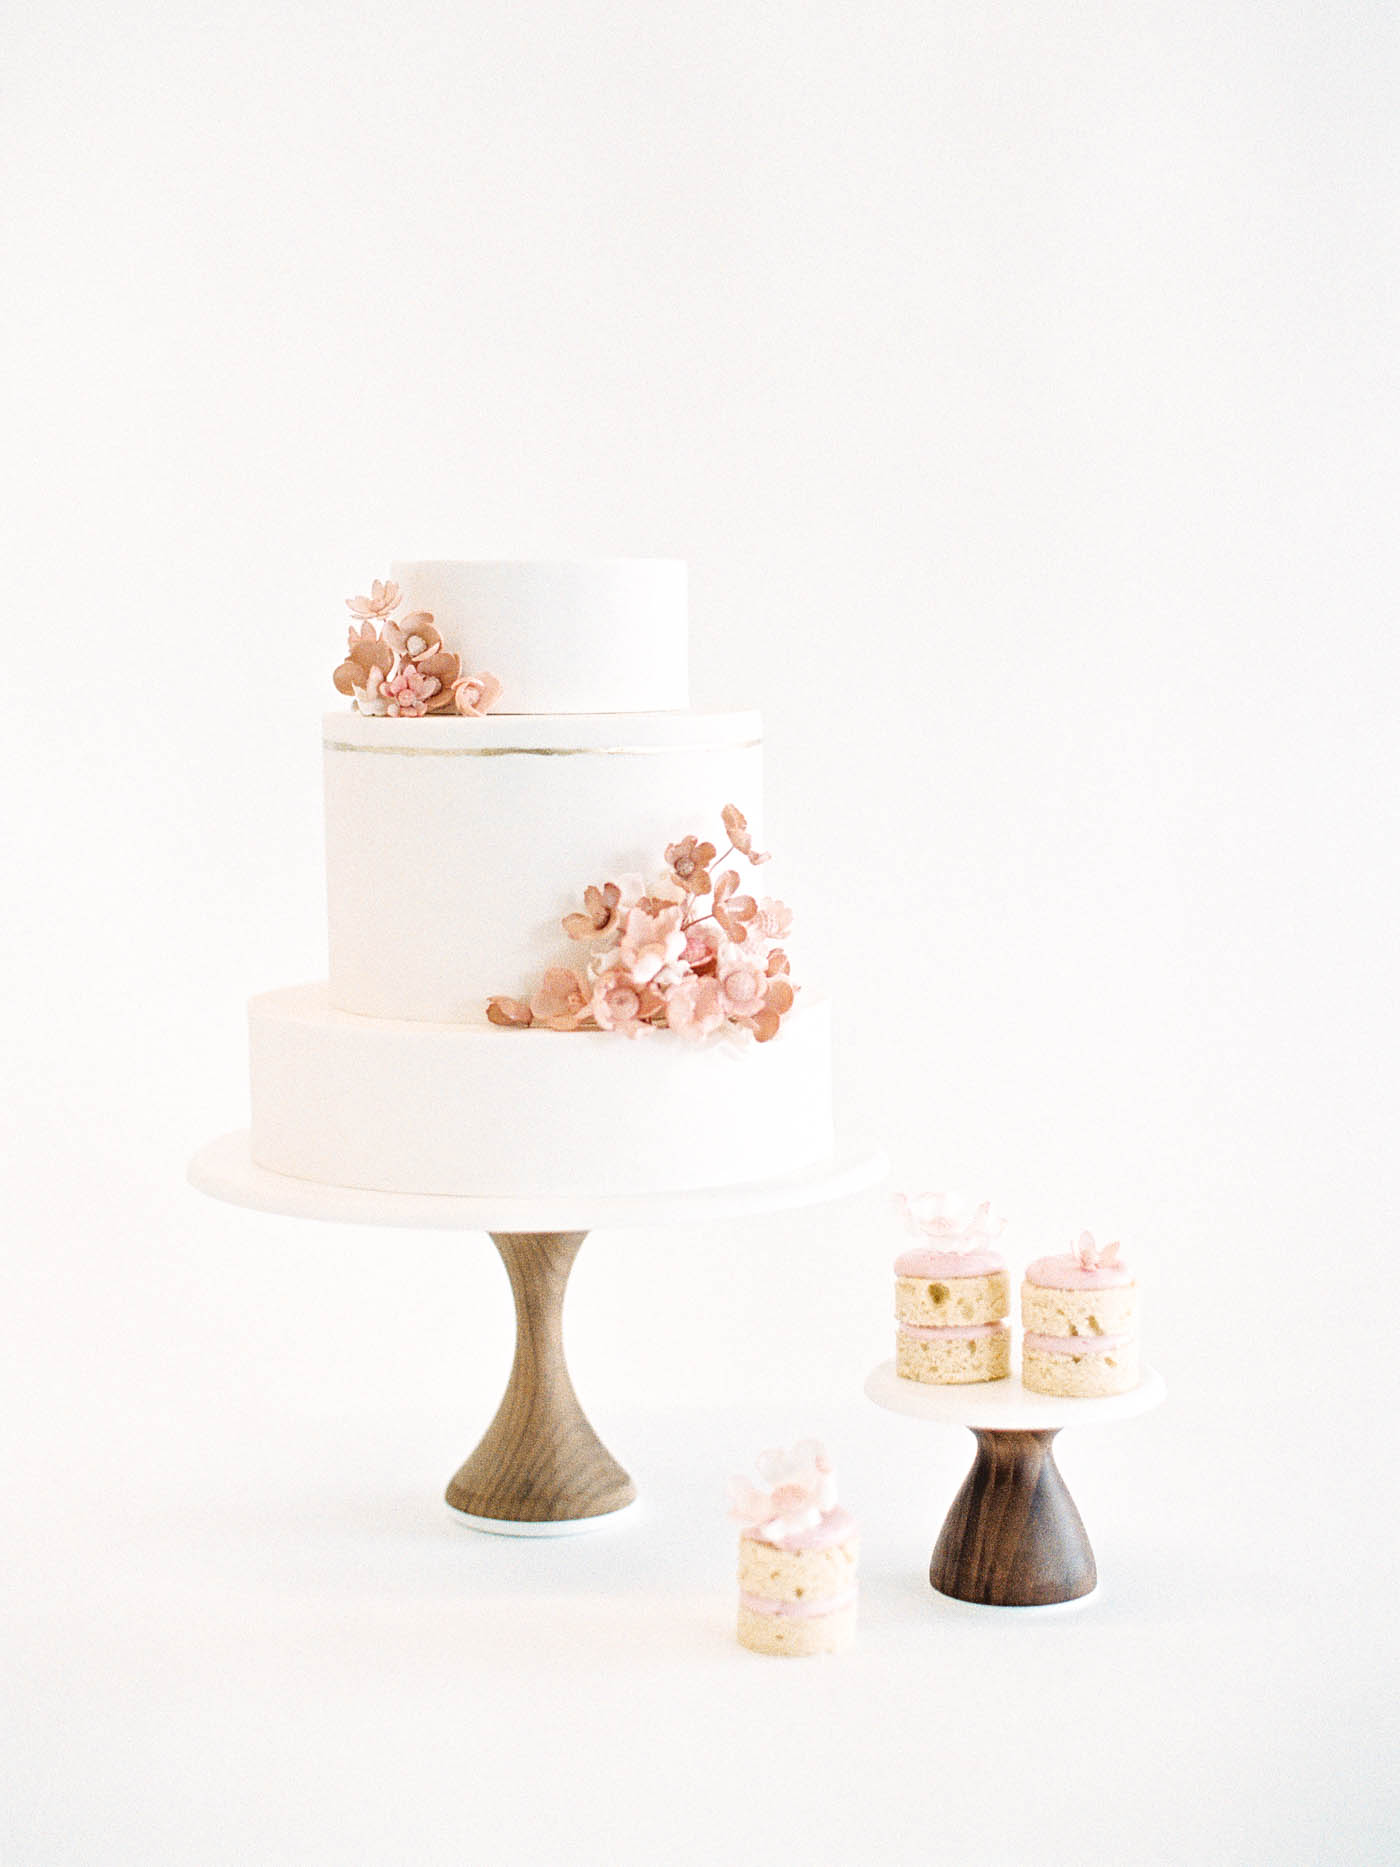 Delicate-Wedding-Cakes-6-Jen_Huang-002343-R1-032.jpg